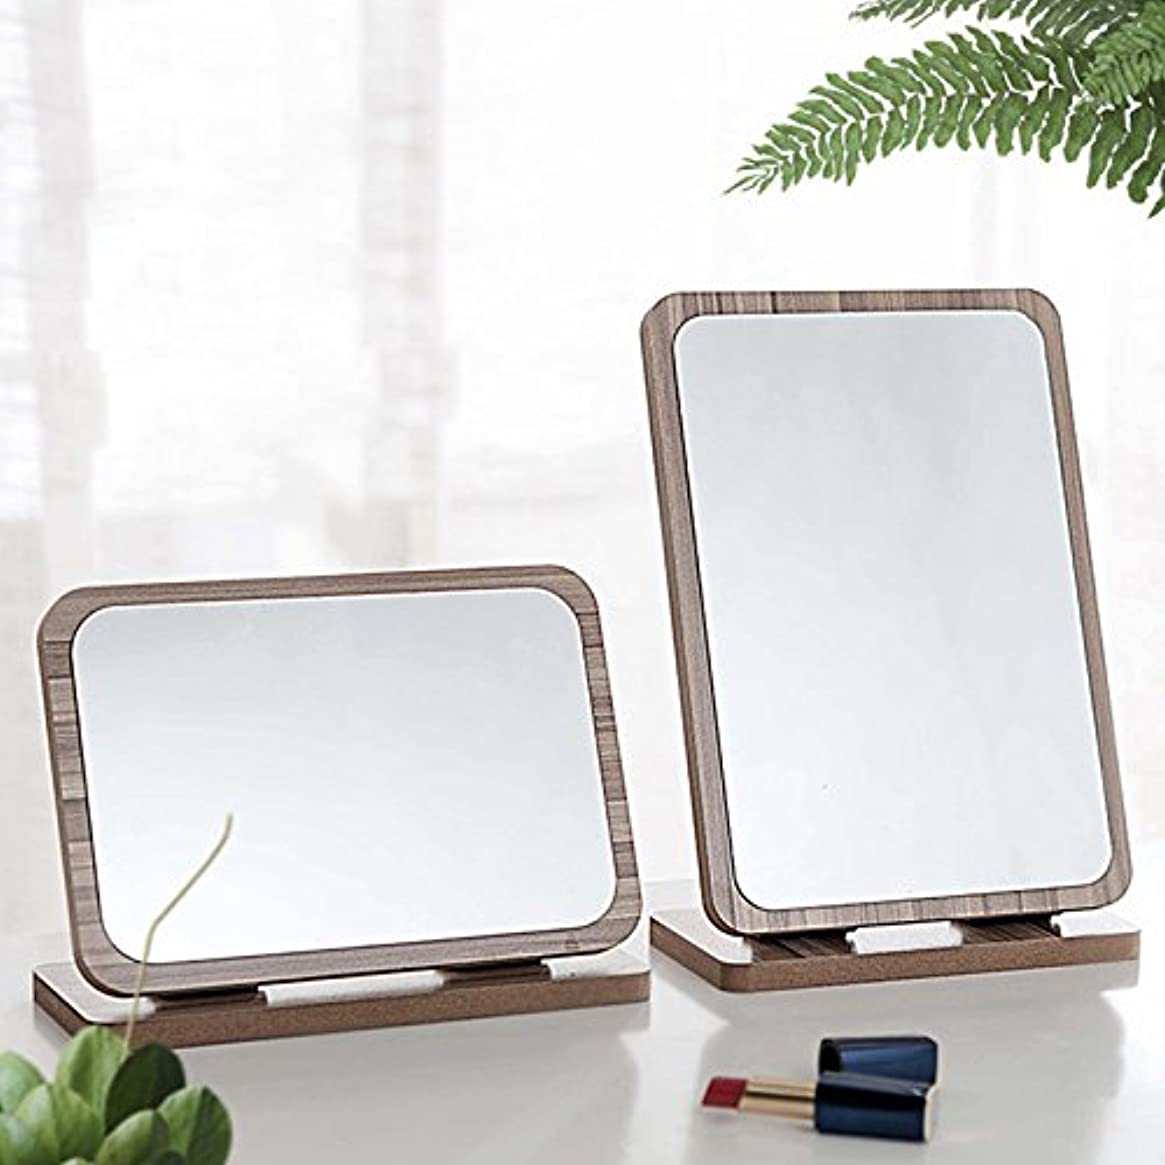 YZUEYT デスクトップ木製の化粧鏡3倍拡大180度回転ポータブルバニティバスルームメイクツール YZUEYT (Color : NO. 10#)